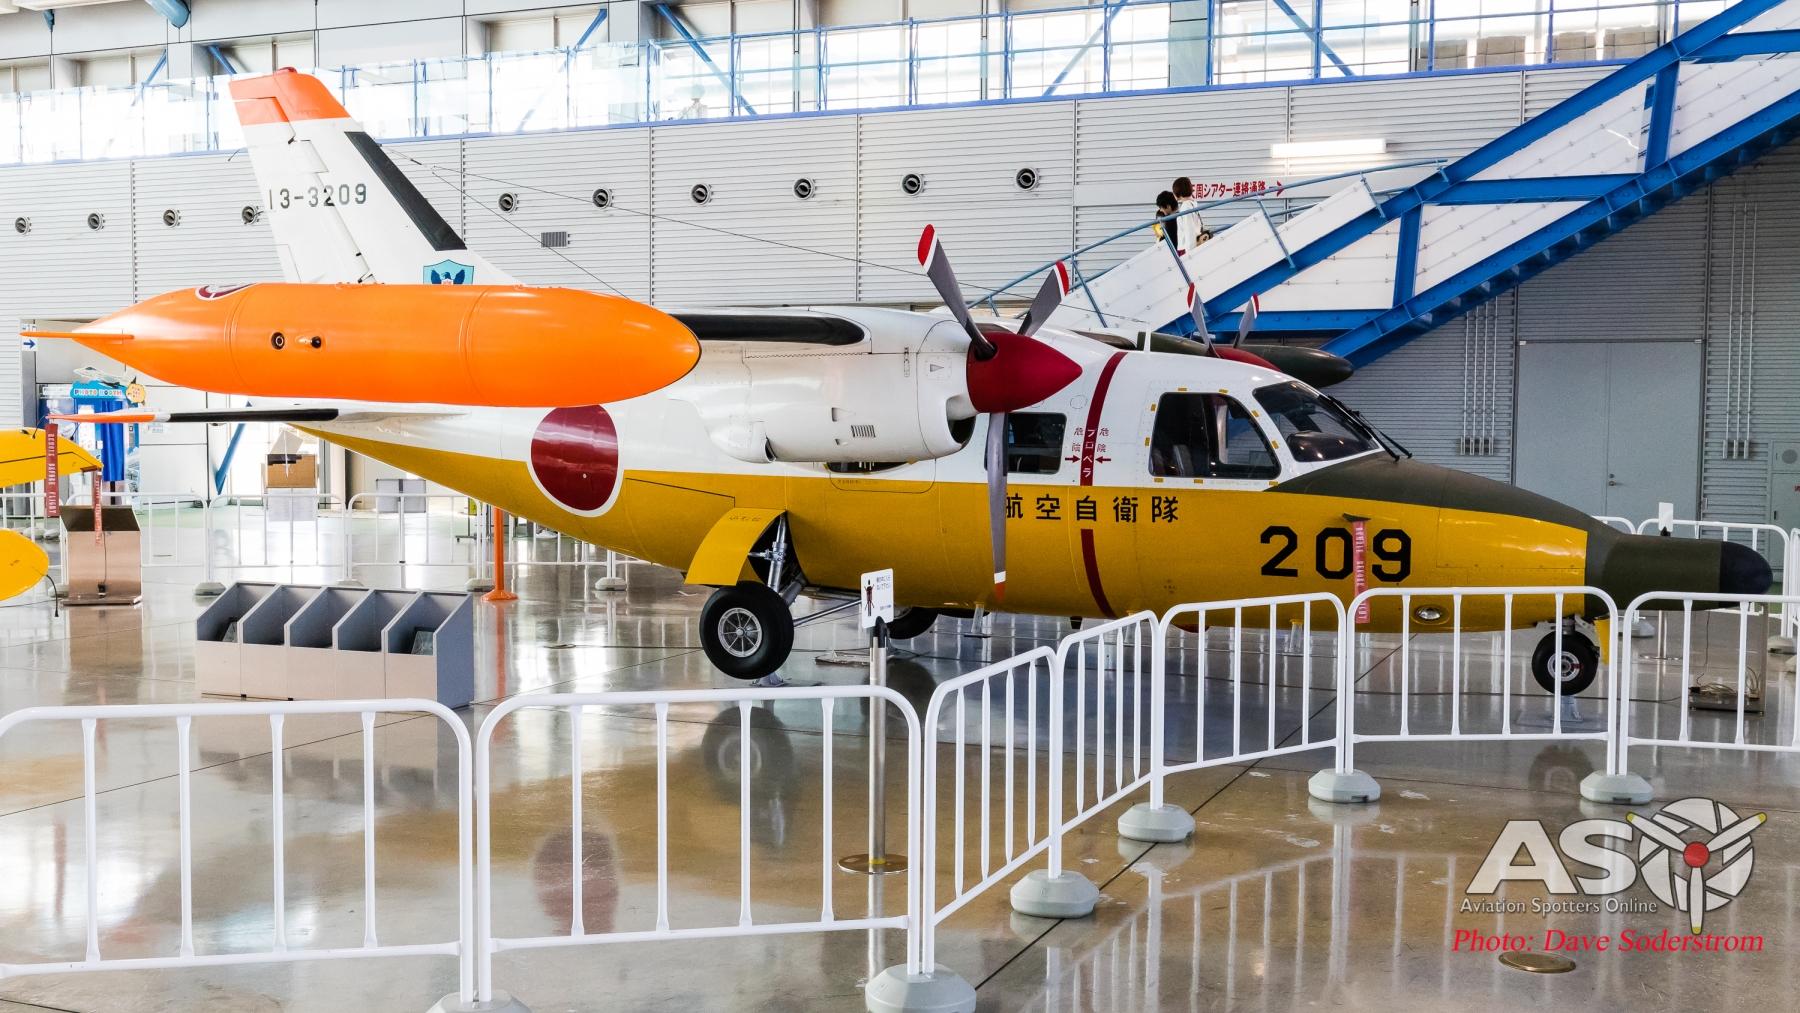 JASDF-Museum-2018-34-1-of-1